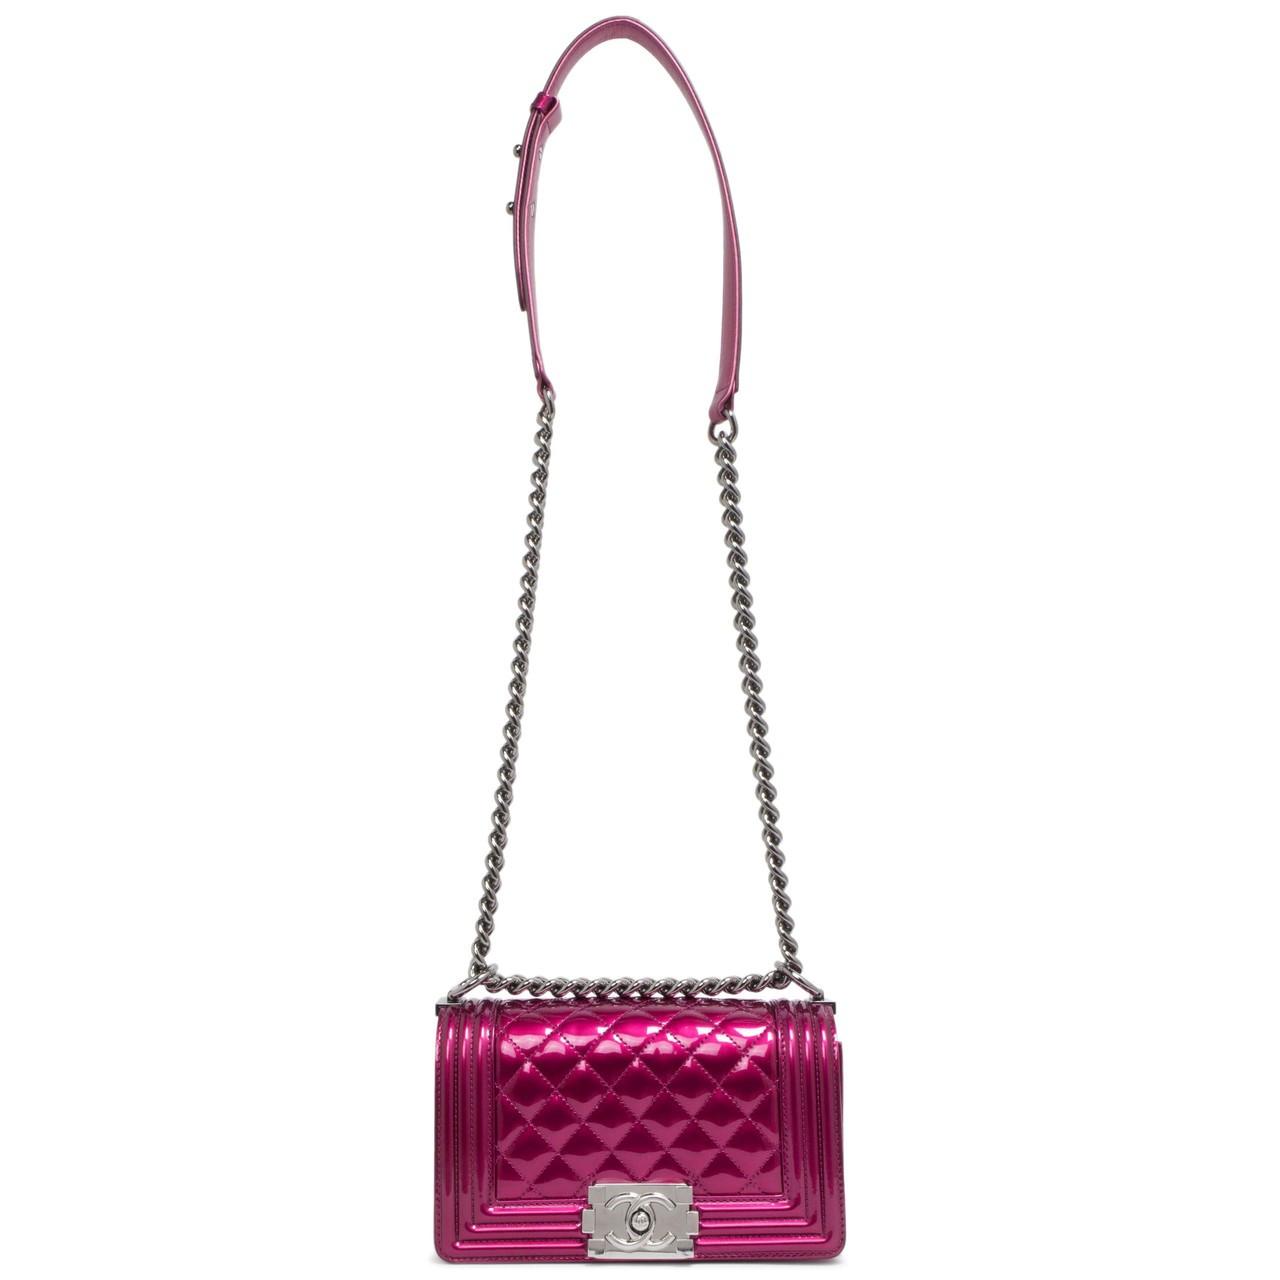 ff43a0f27c92 Chanel Fuchsia Metallic Patent Small Boy Bag - modaselle